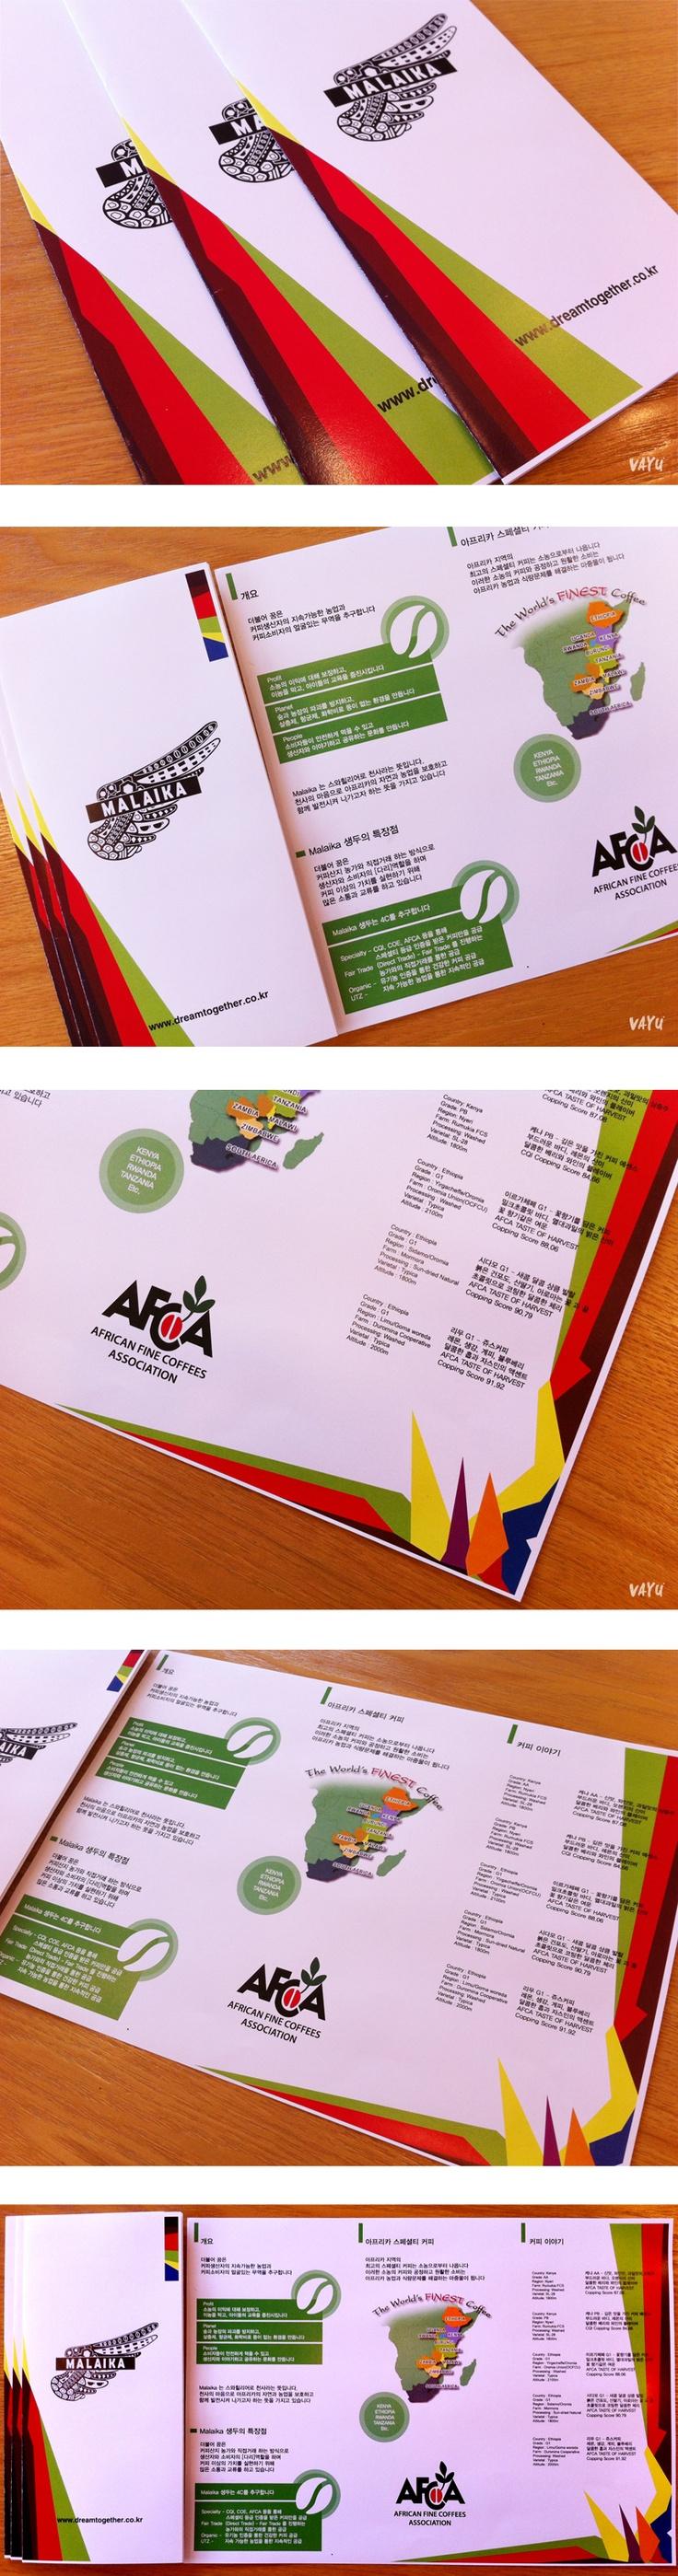 Brochure design / Client_dreamtogether / Design by vayu